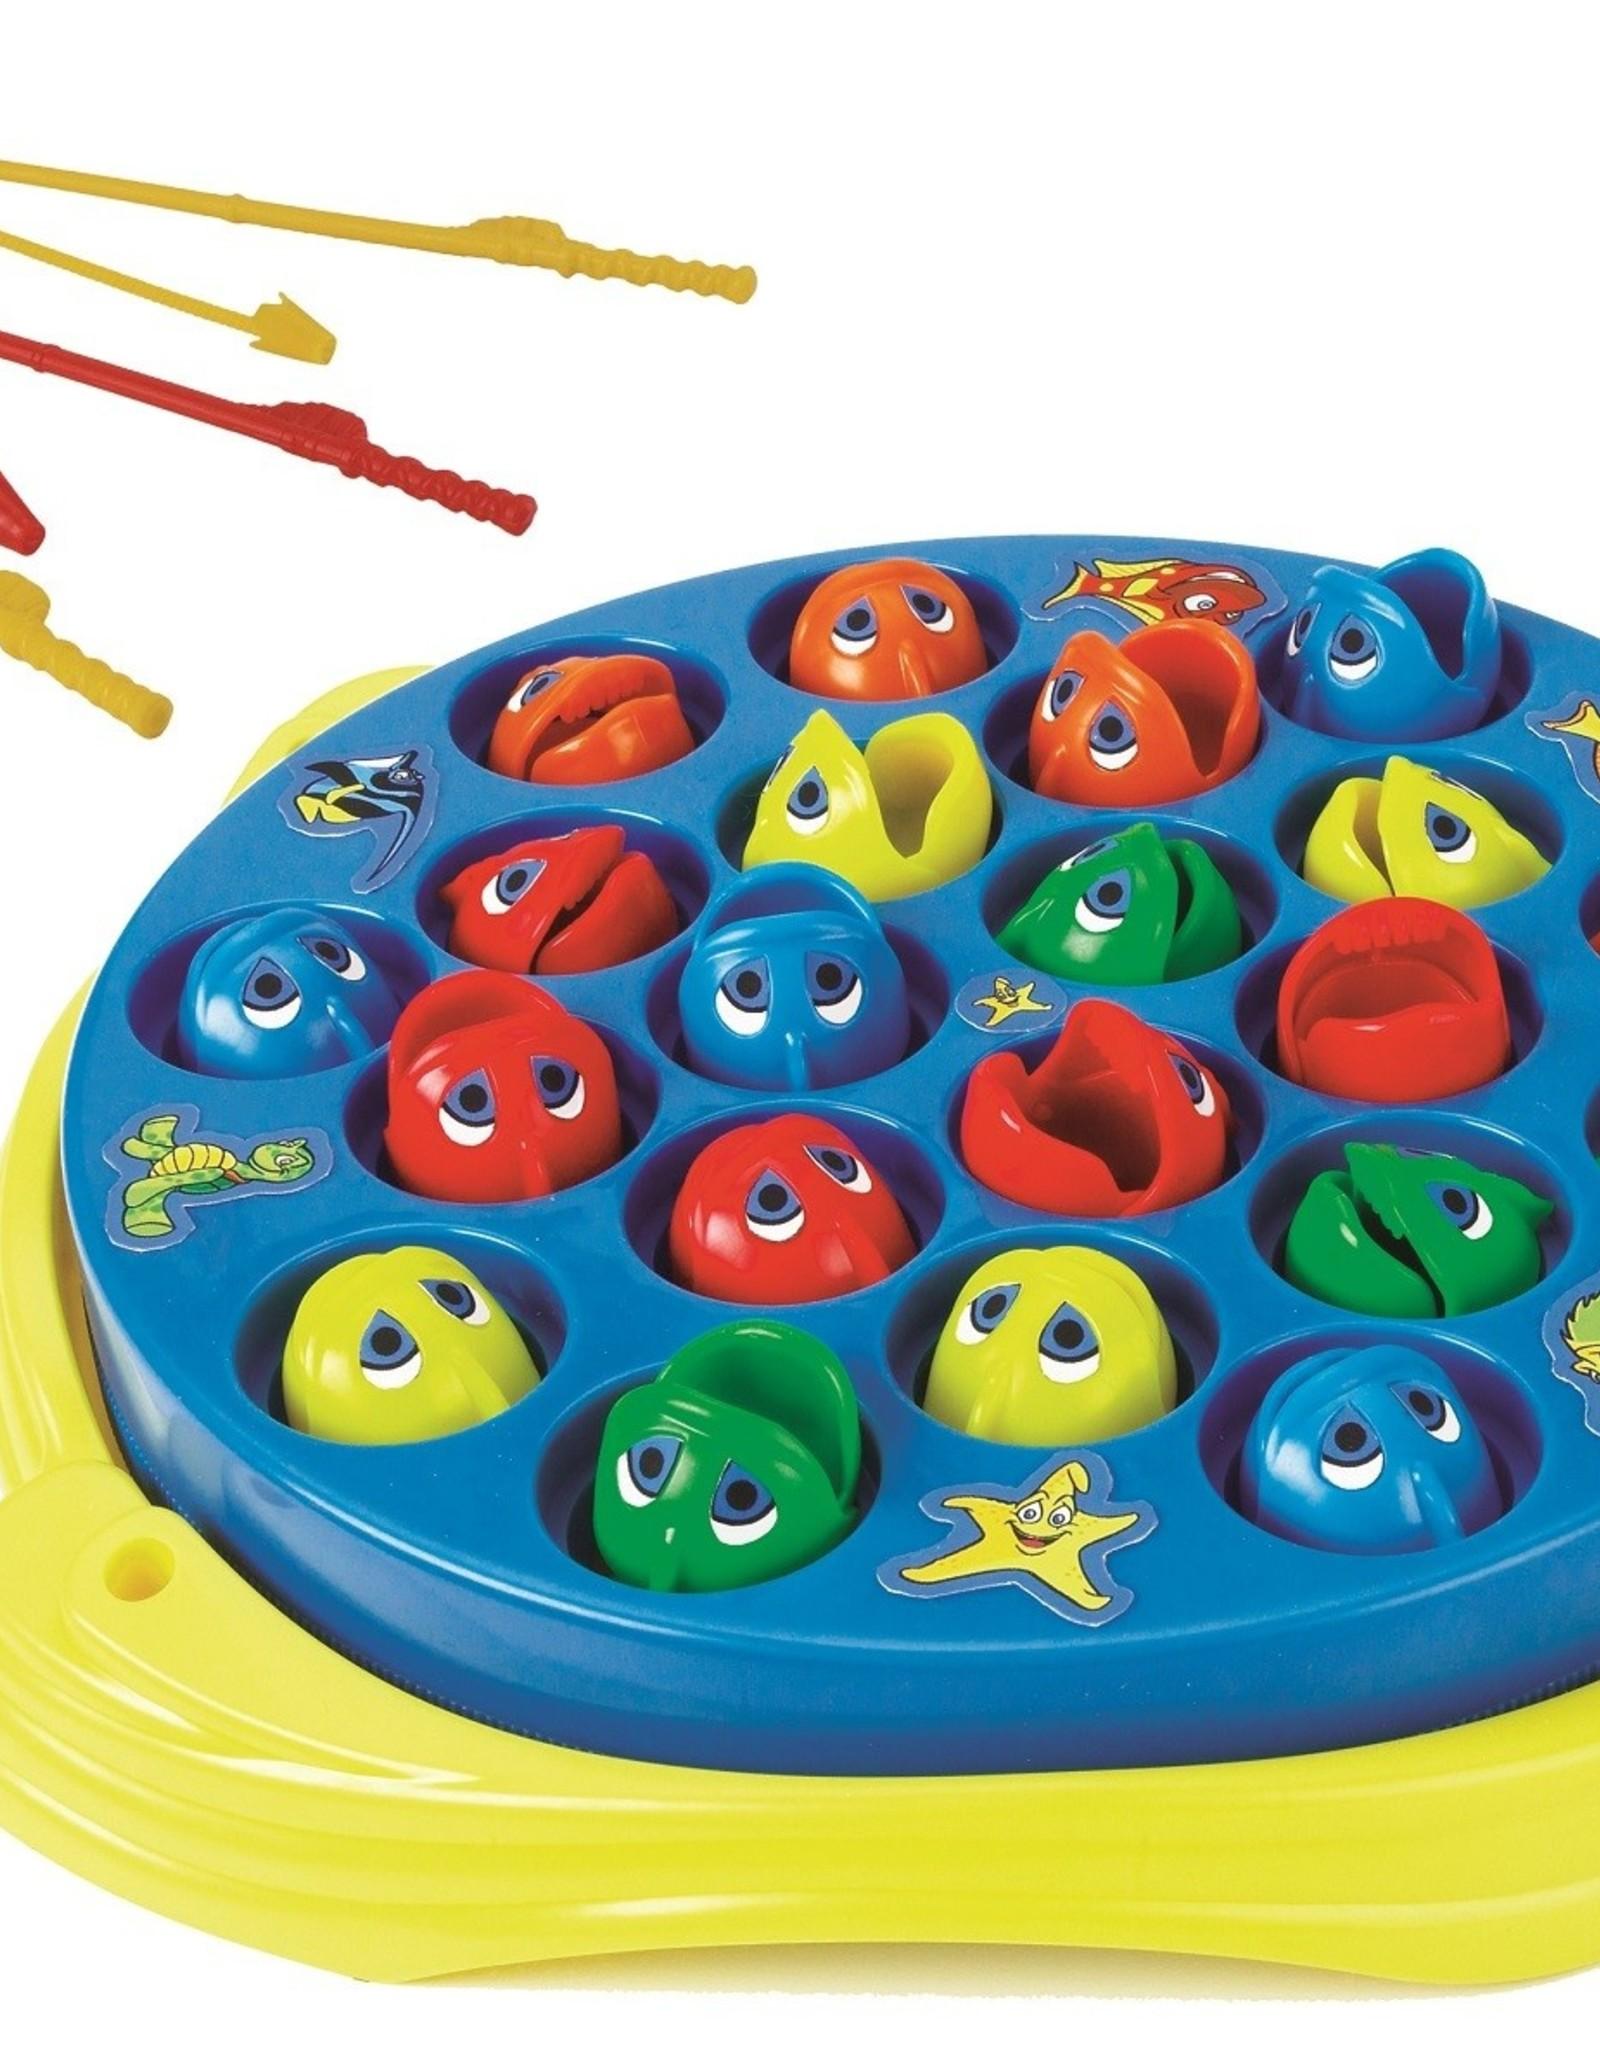 Pressman Toys Let's Go Fishin'